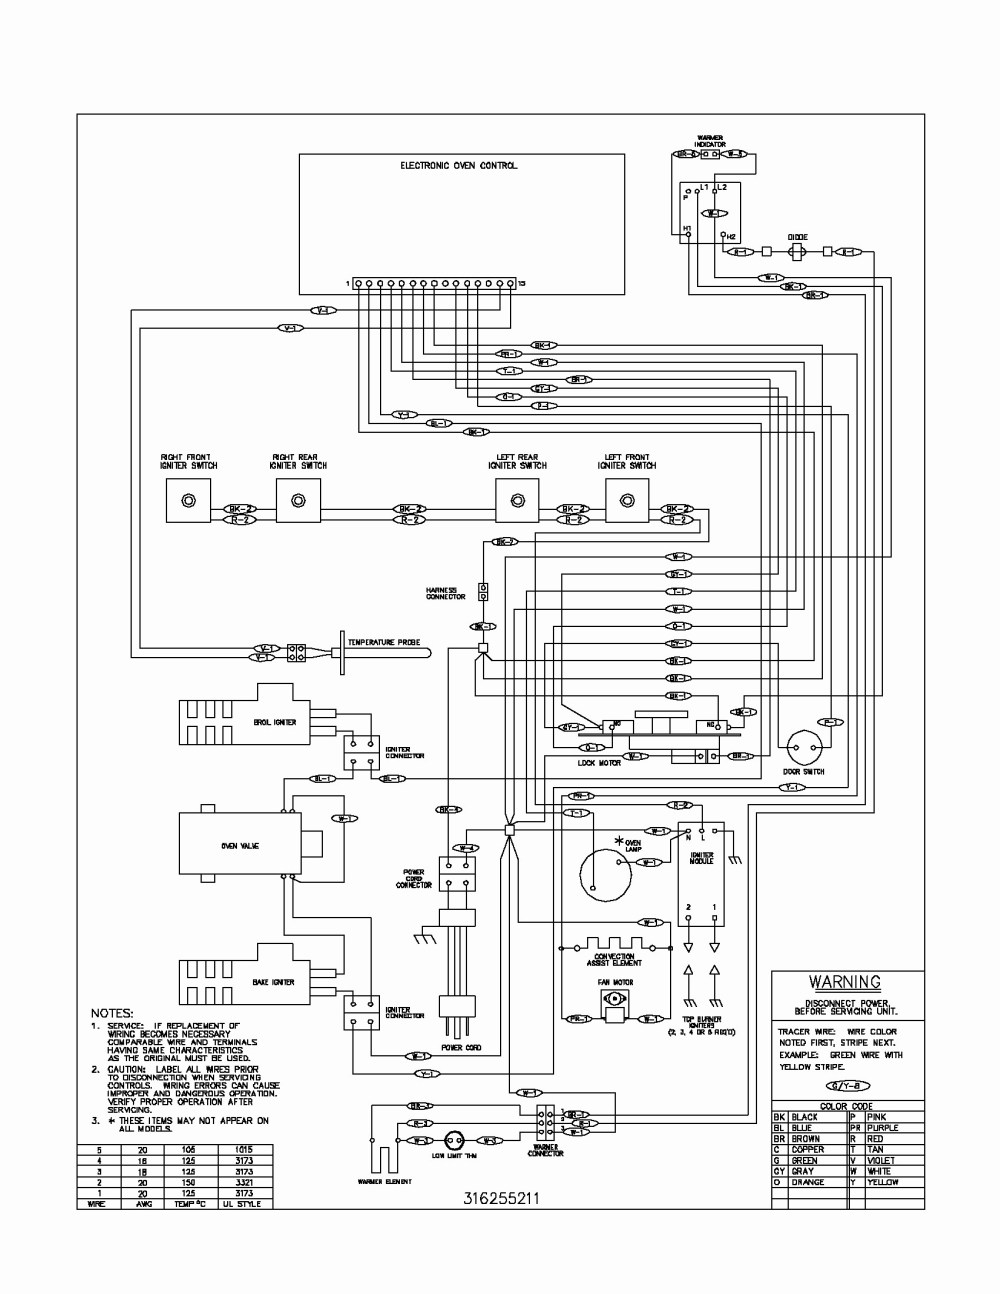 medium resolution of diy powder coating oven wiring diagram powder coat oven wiring diagram gallery electrical wiring diagram